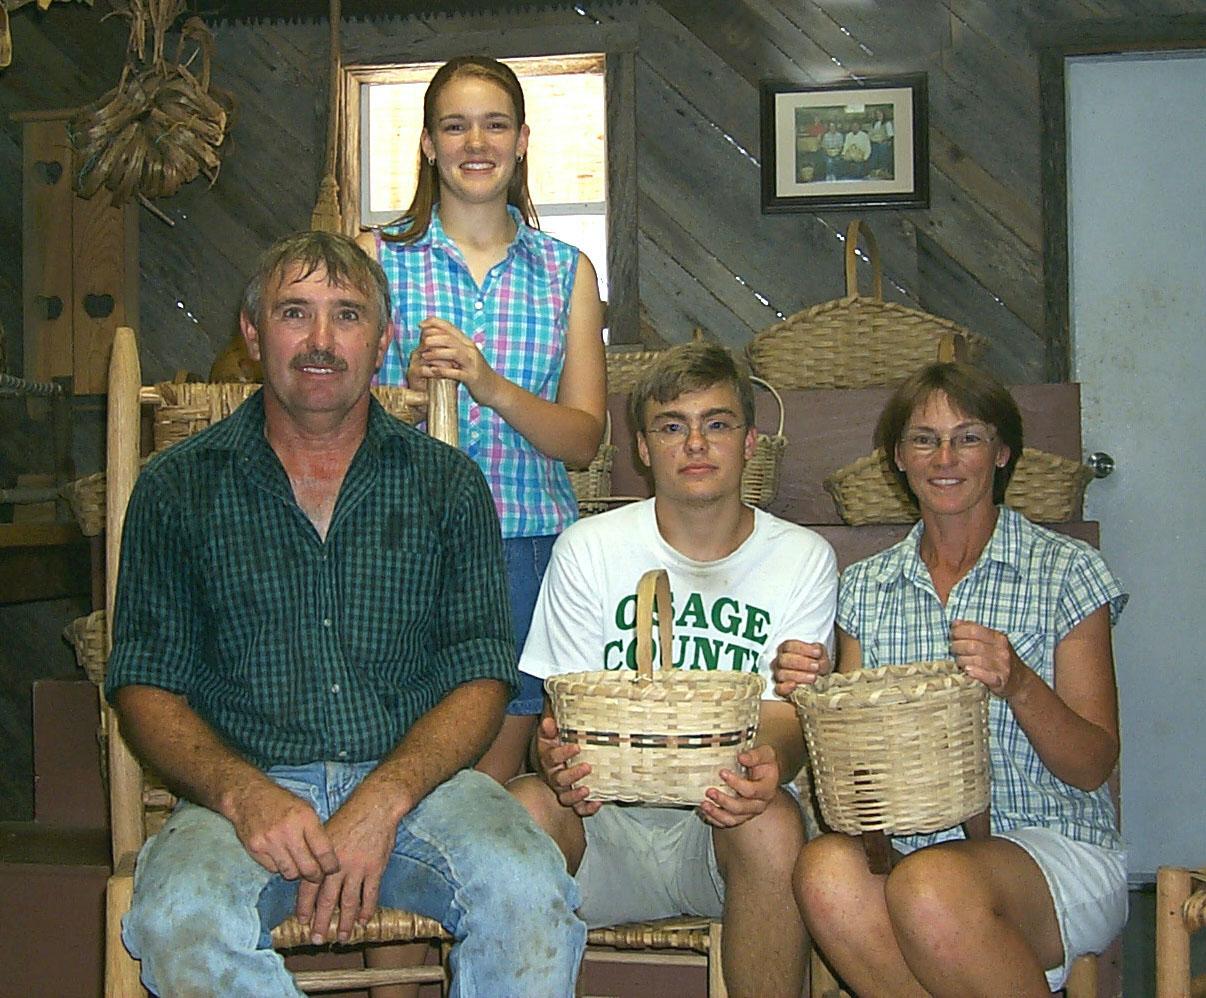 The Family Dudenhoeffers